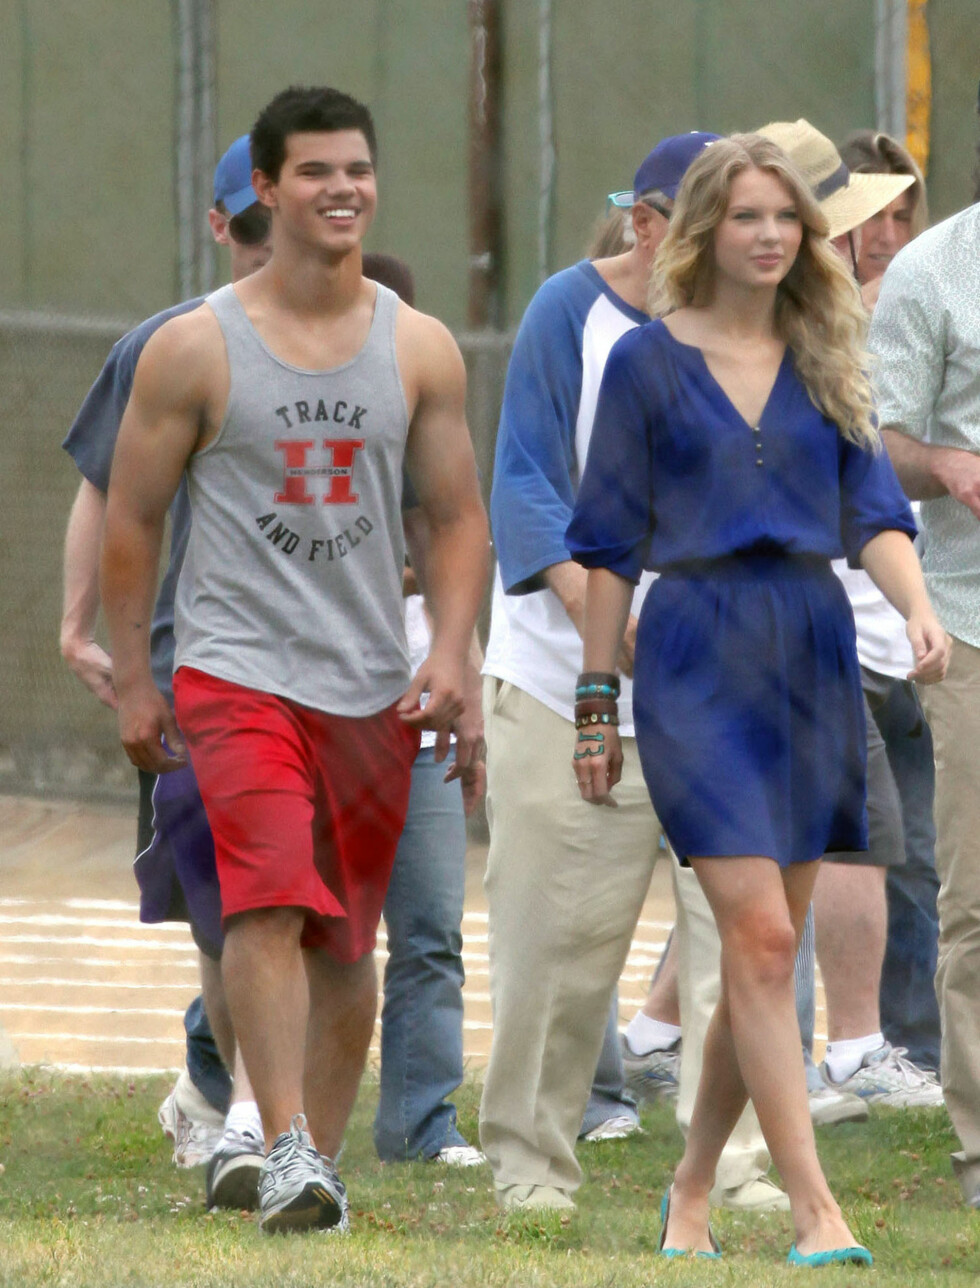 TAYLOR GANGER TO: Samme året som John Mayer og Swift holdt på, hadde sangerinnen et forhold med Twilight-stjerne Taylor Lautner. Foto: Stella Pictures